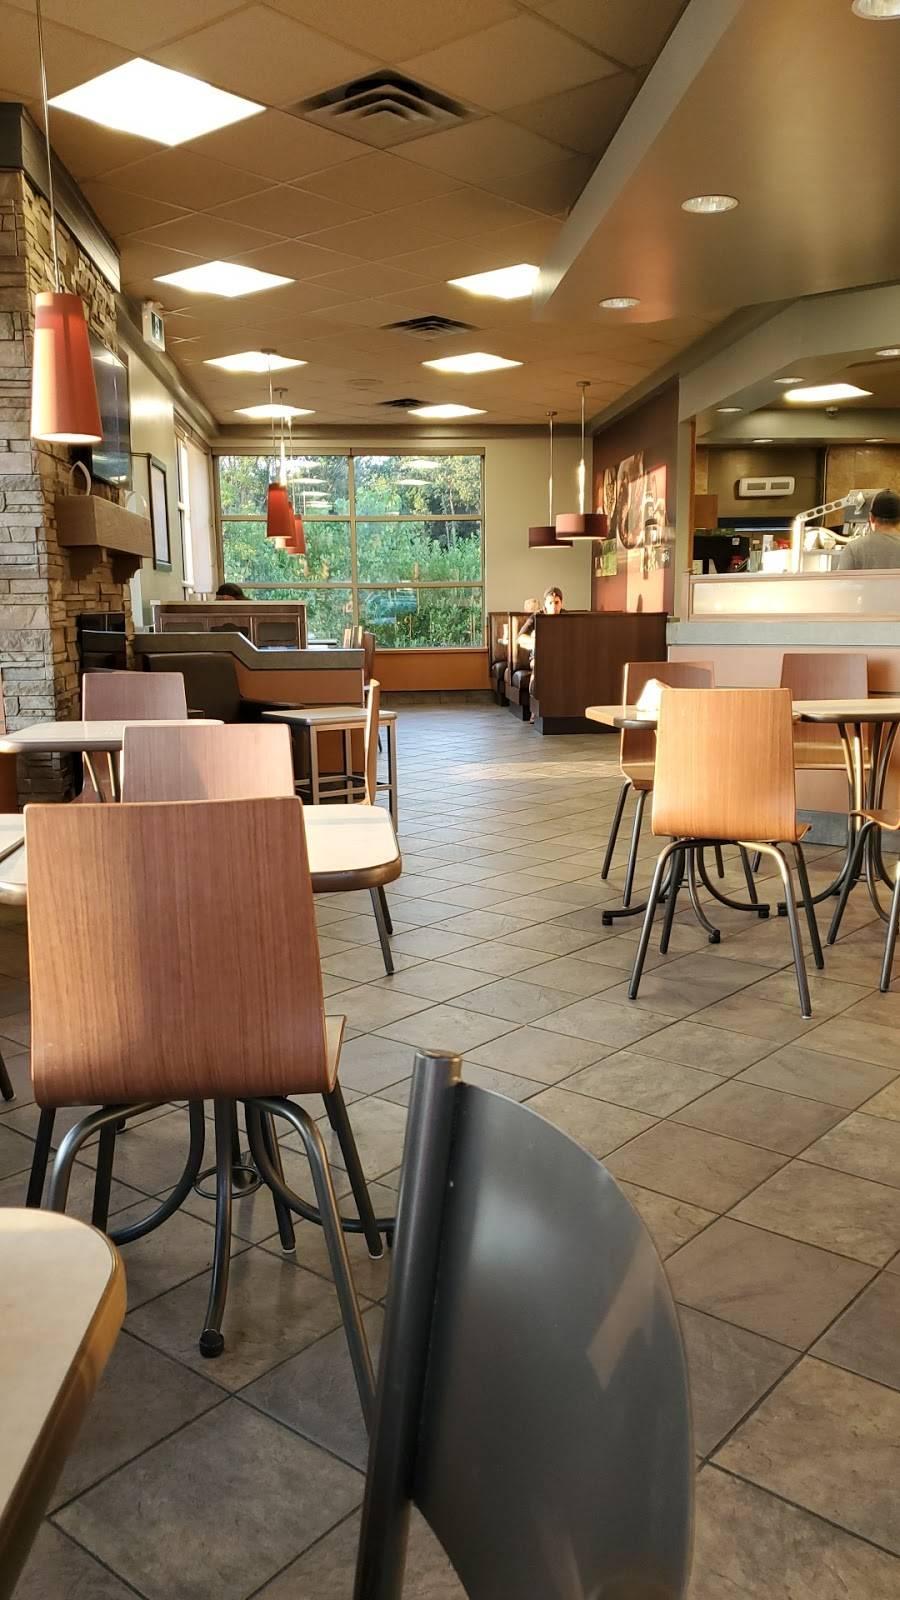 Tim Hortons - restaurant  | Photo 2 of 10 | Address: 5495 Ojibway Pkwy, Windsor, ON N9C 3Y4, Canada | Phone: (519) 972-1867